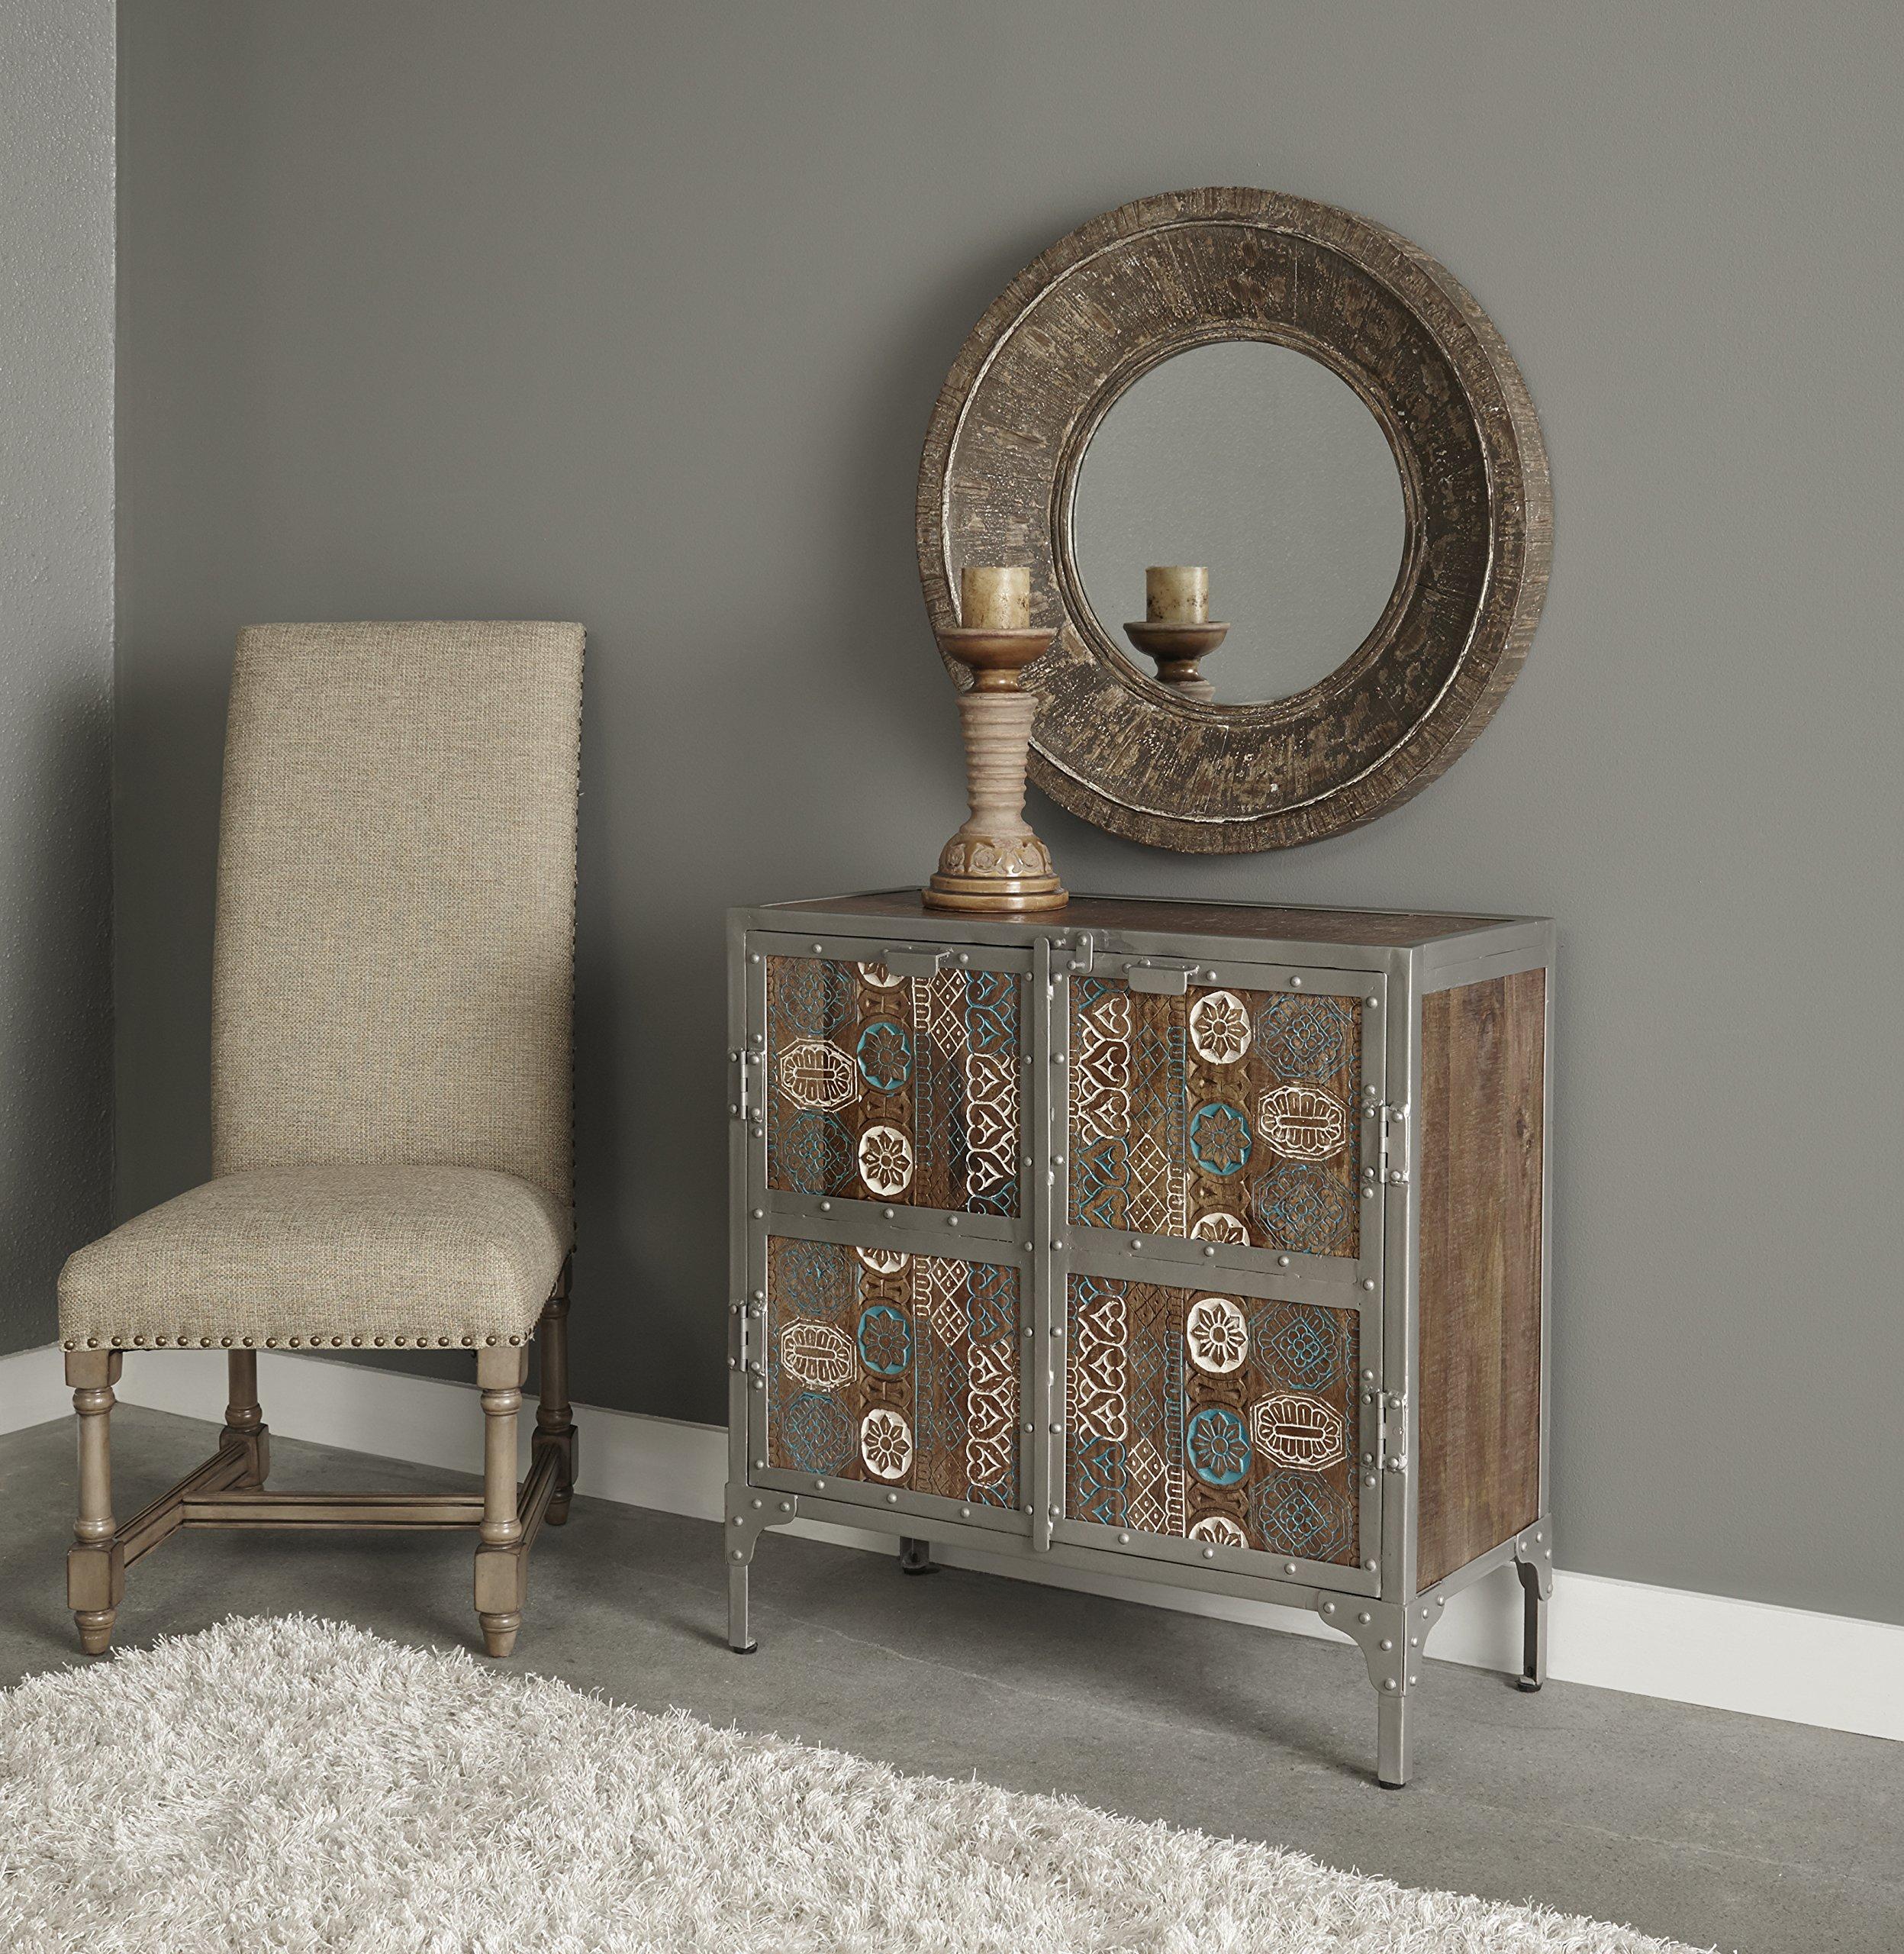 Treasure Trove Accents 17662 Two Door Cabinet, Multicolored by Treasure Trove Accents (Image #3)